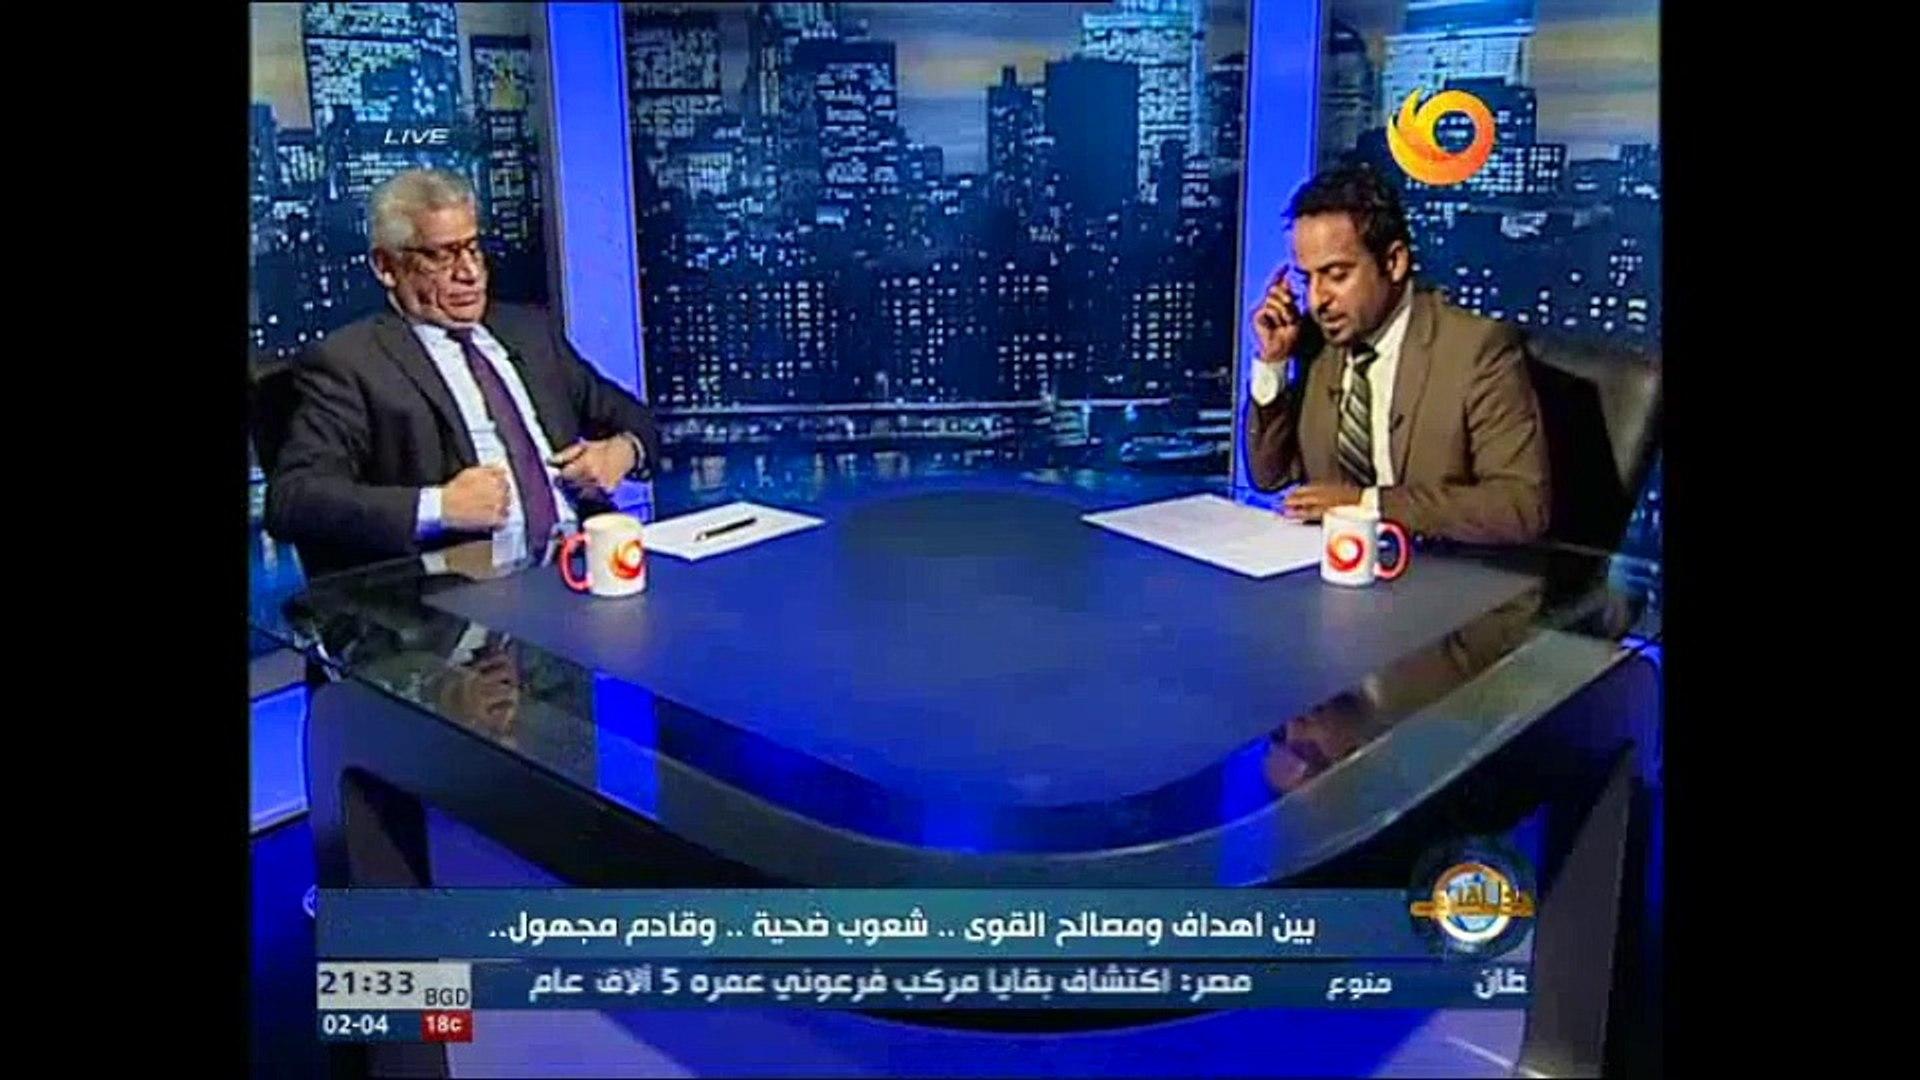 05.02.2016 الاعلامي كريم بدر